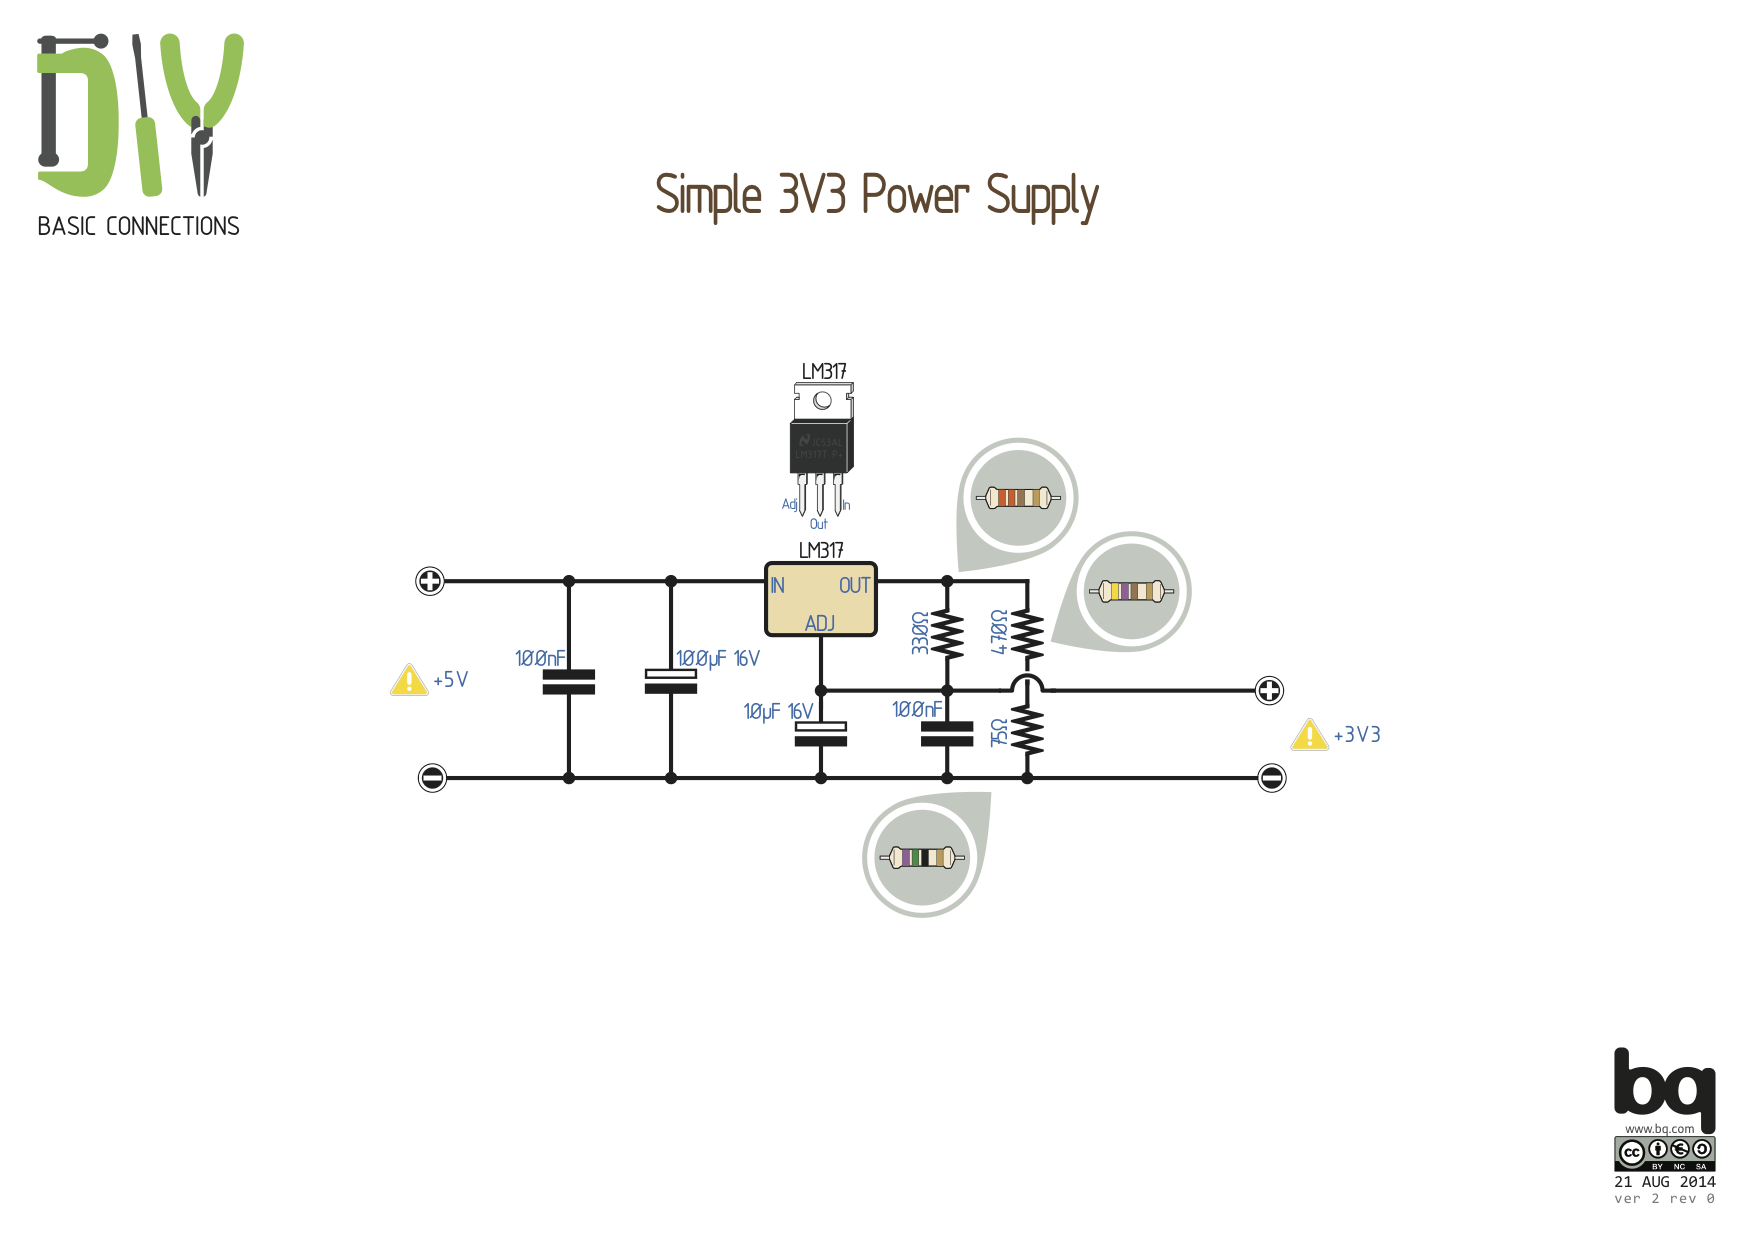 Pighisimple 3v3 Power Supply